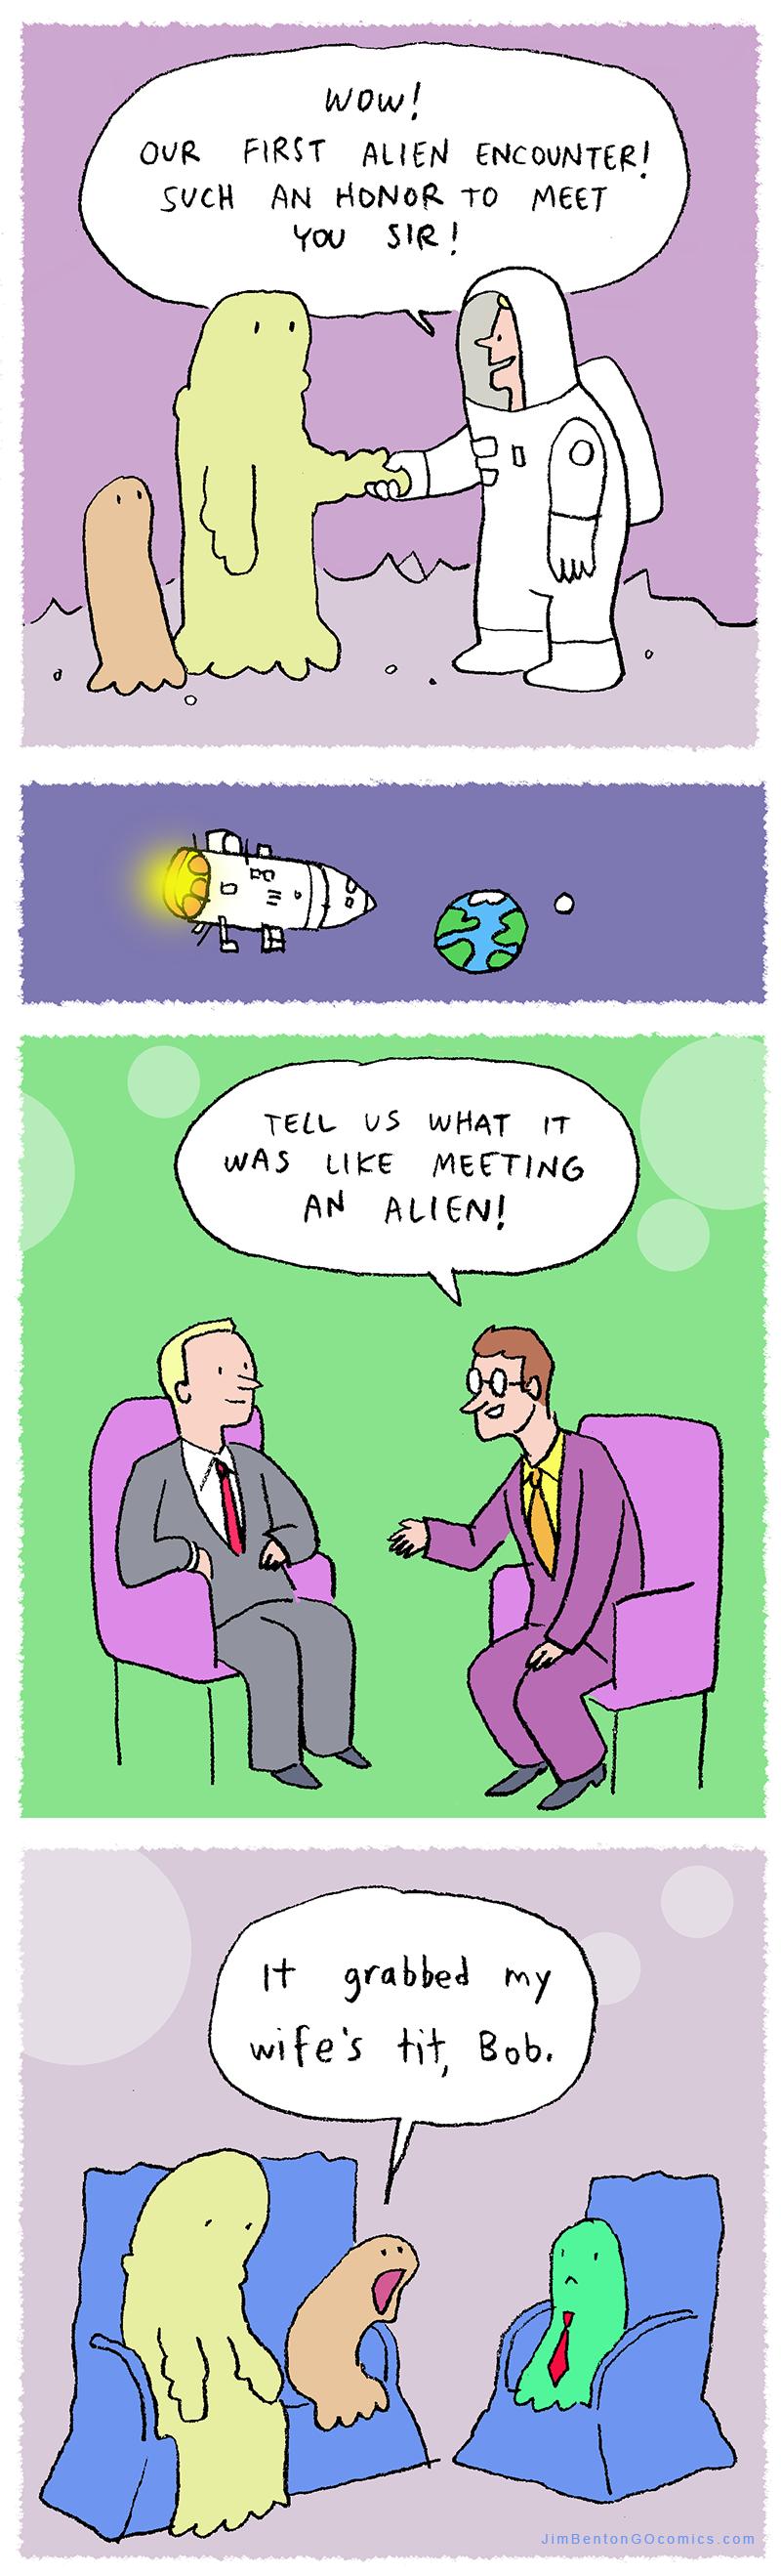 First alien encounter.